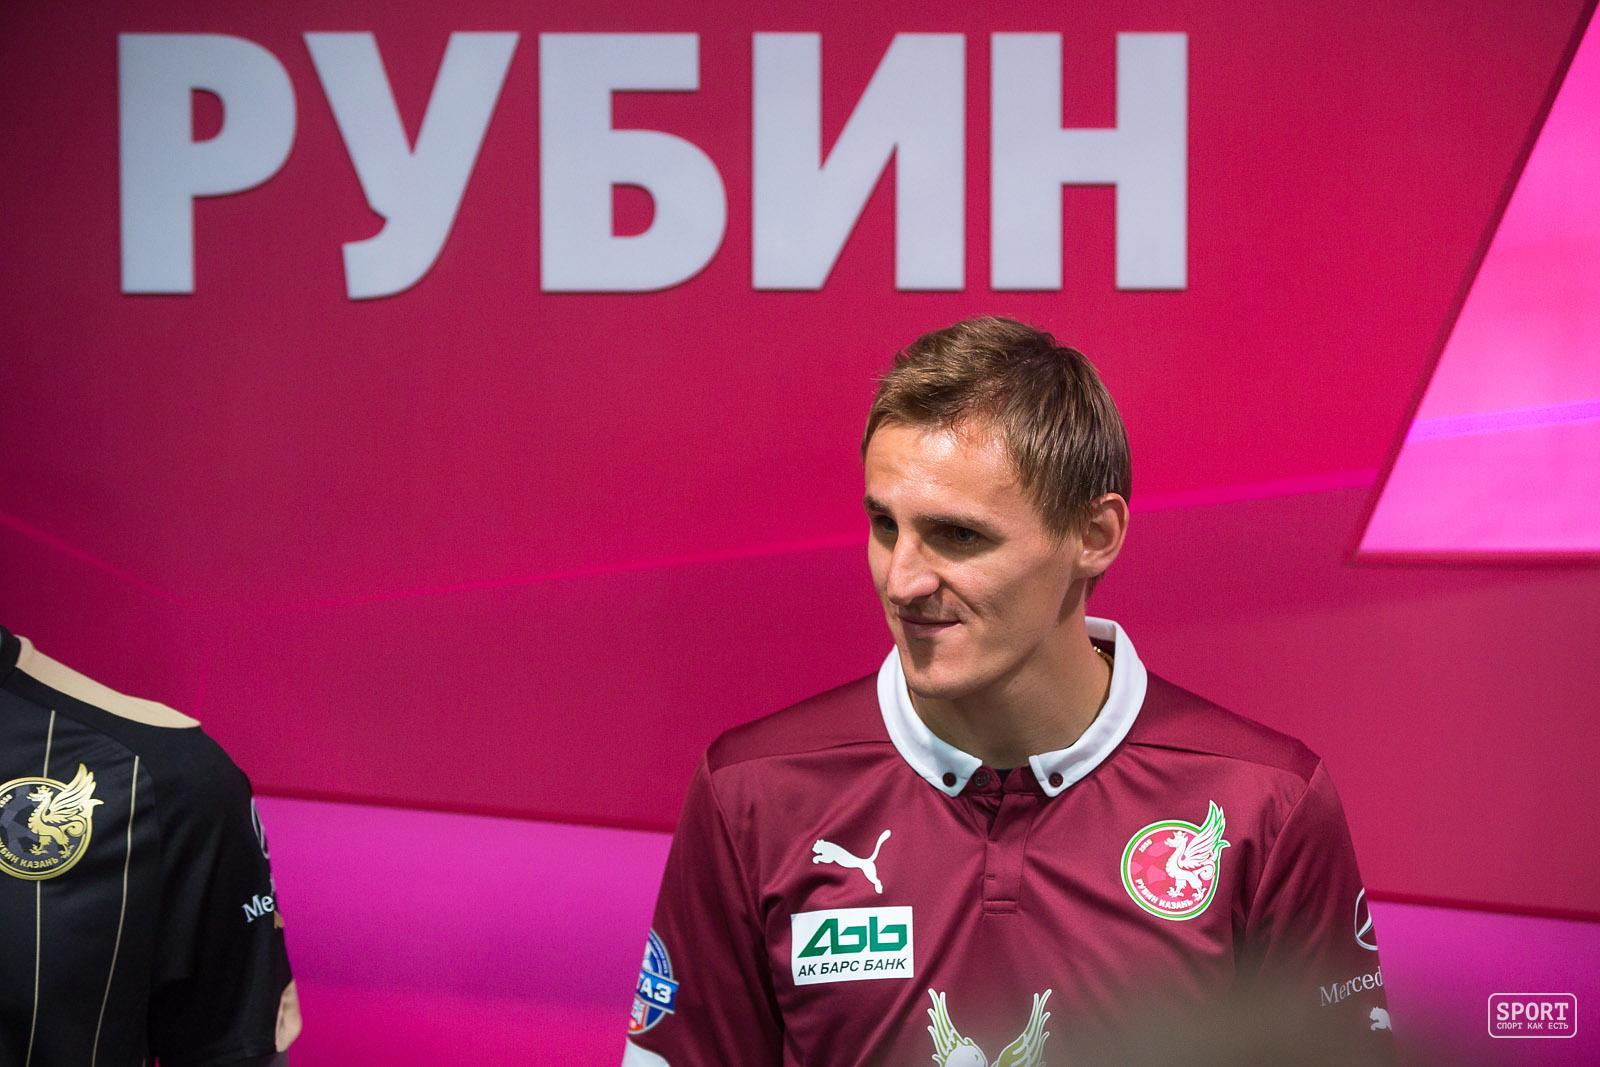 павлюченко забил гол 4 картинки 2012: